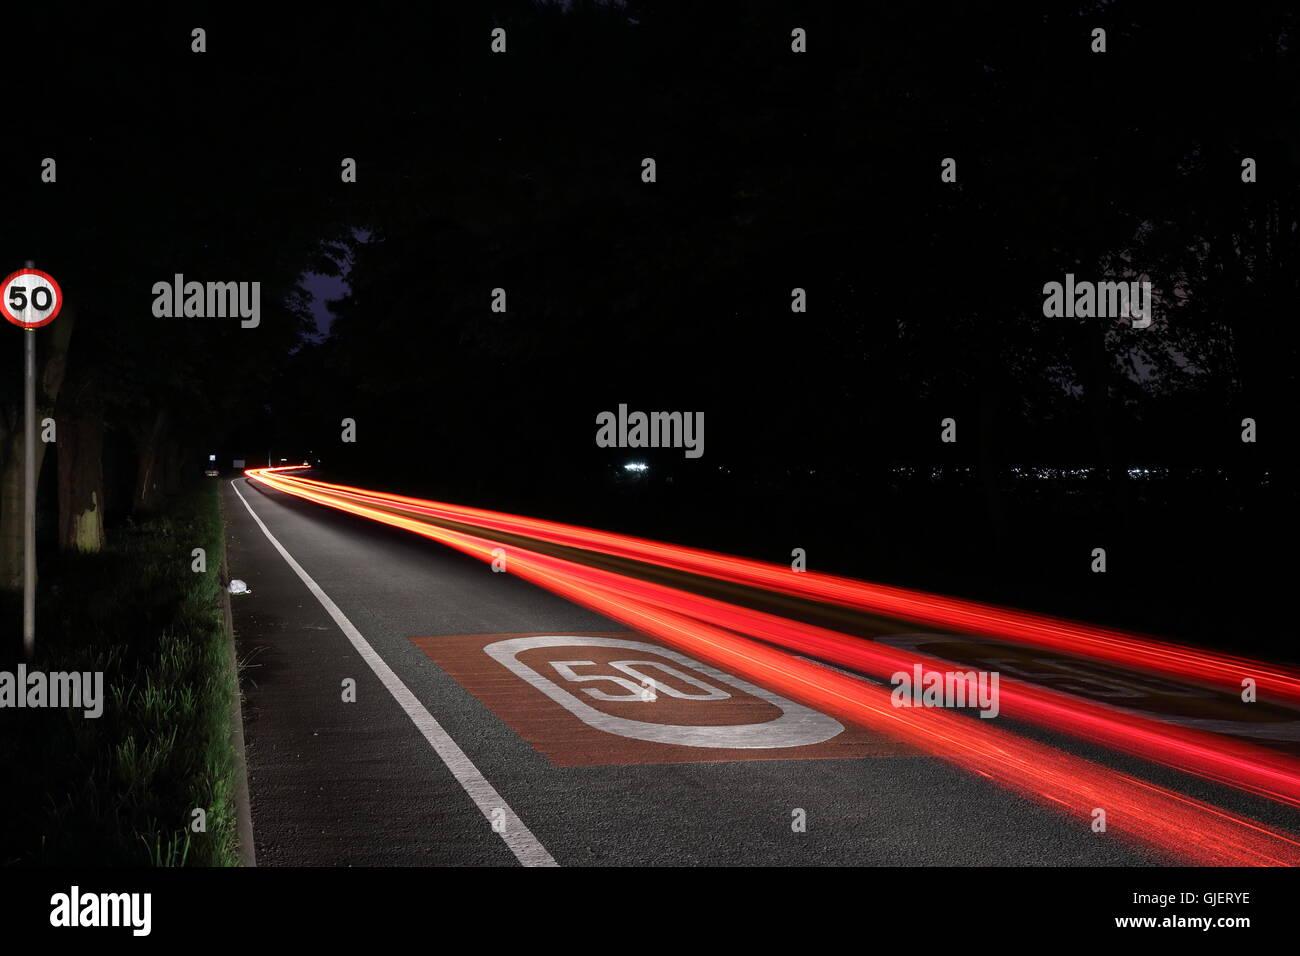 Fast Car Light Trail - Stock Image